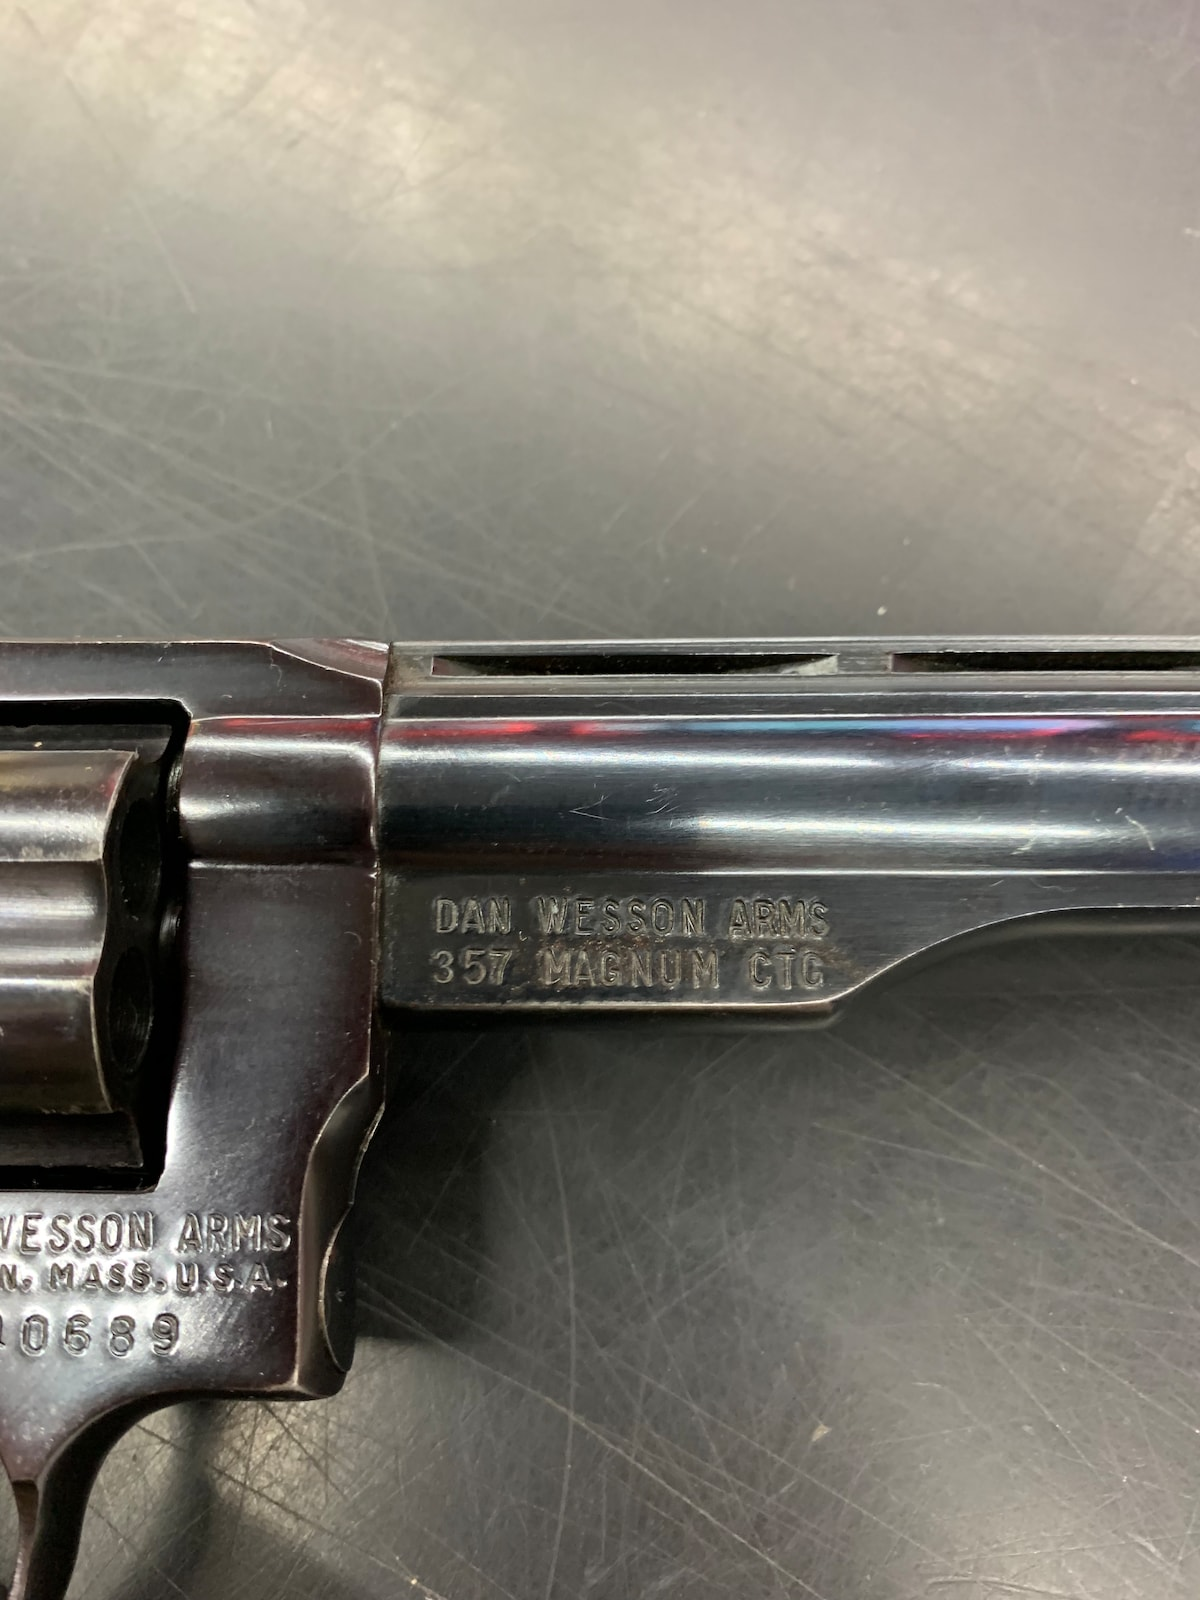 DAN WESSON 357 MAGNUM CTG 1970s